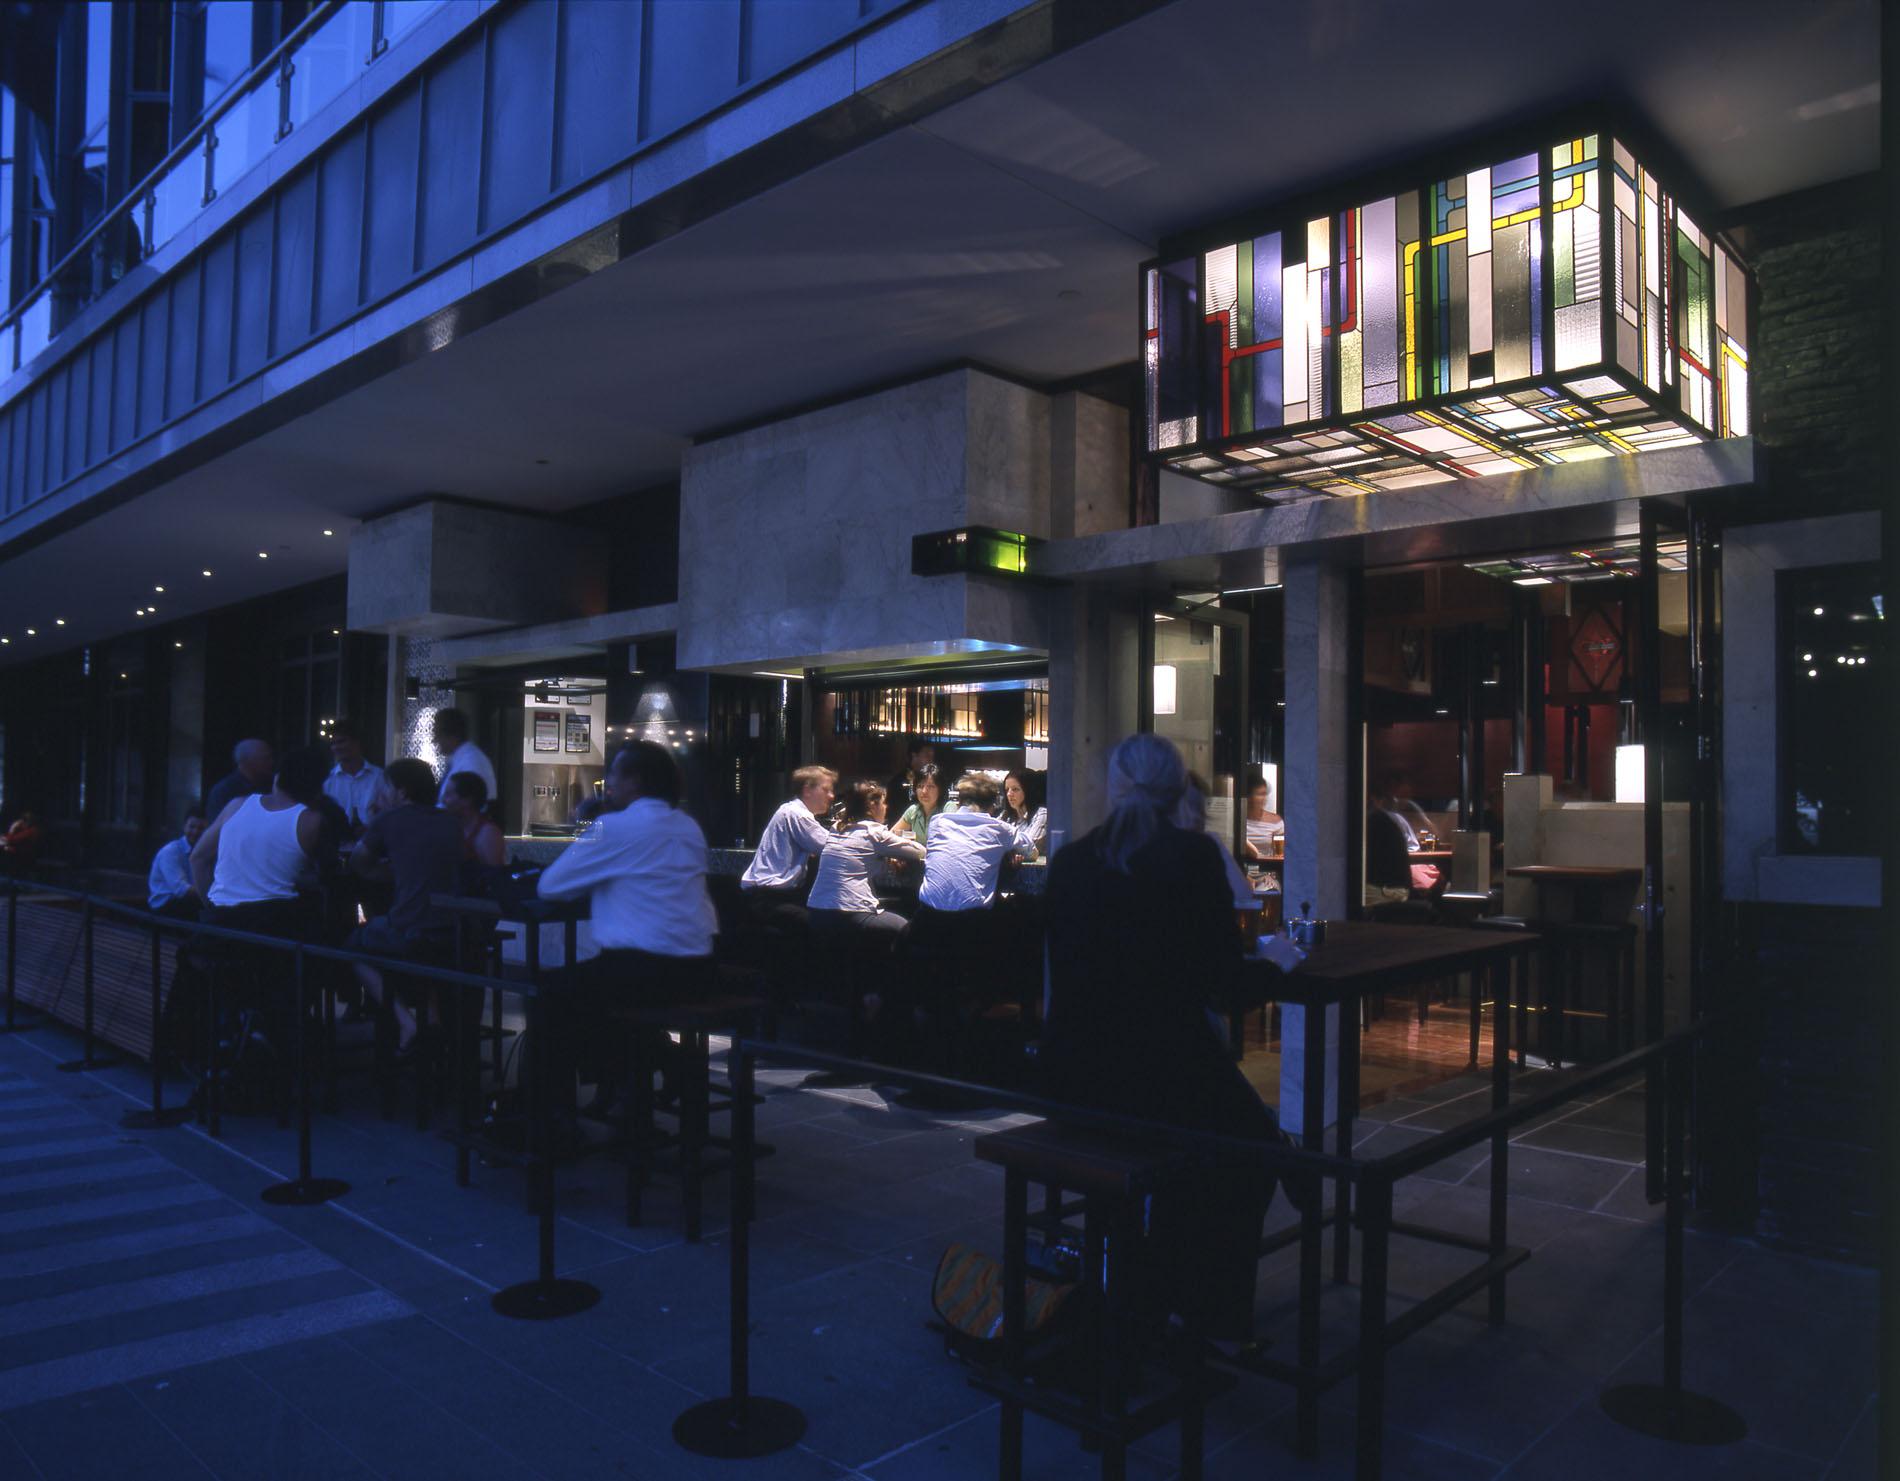 City Square-30-TMein_LRWeb.jpg